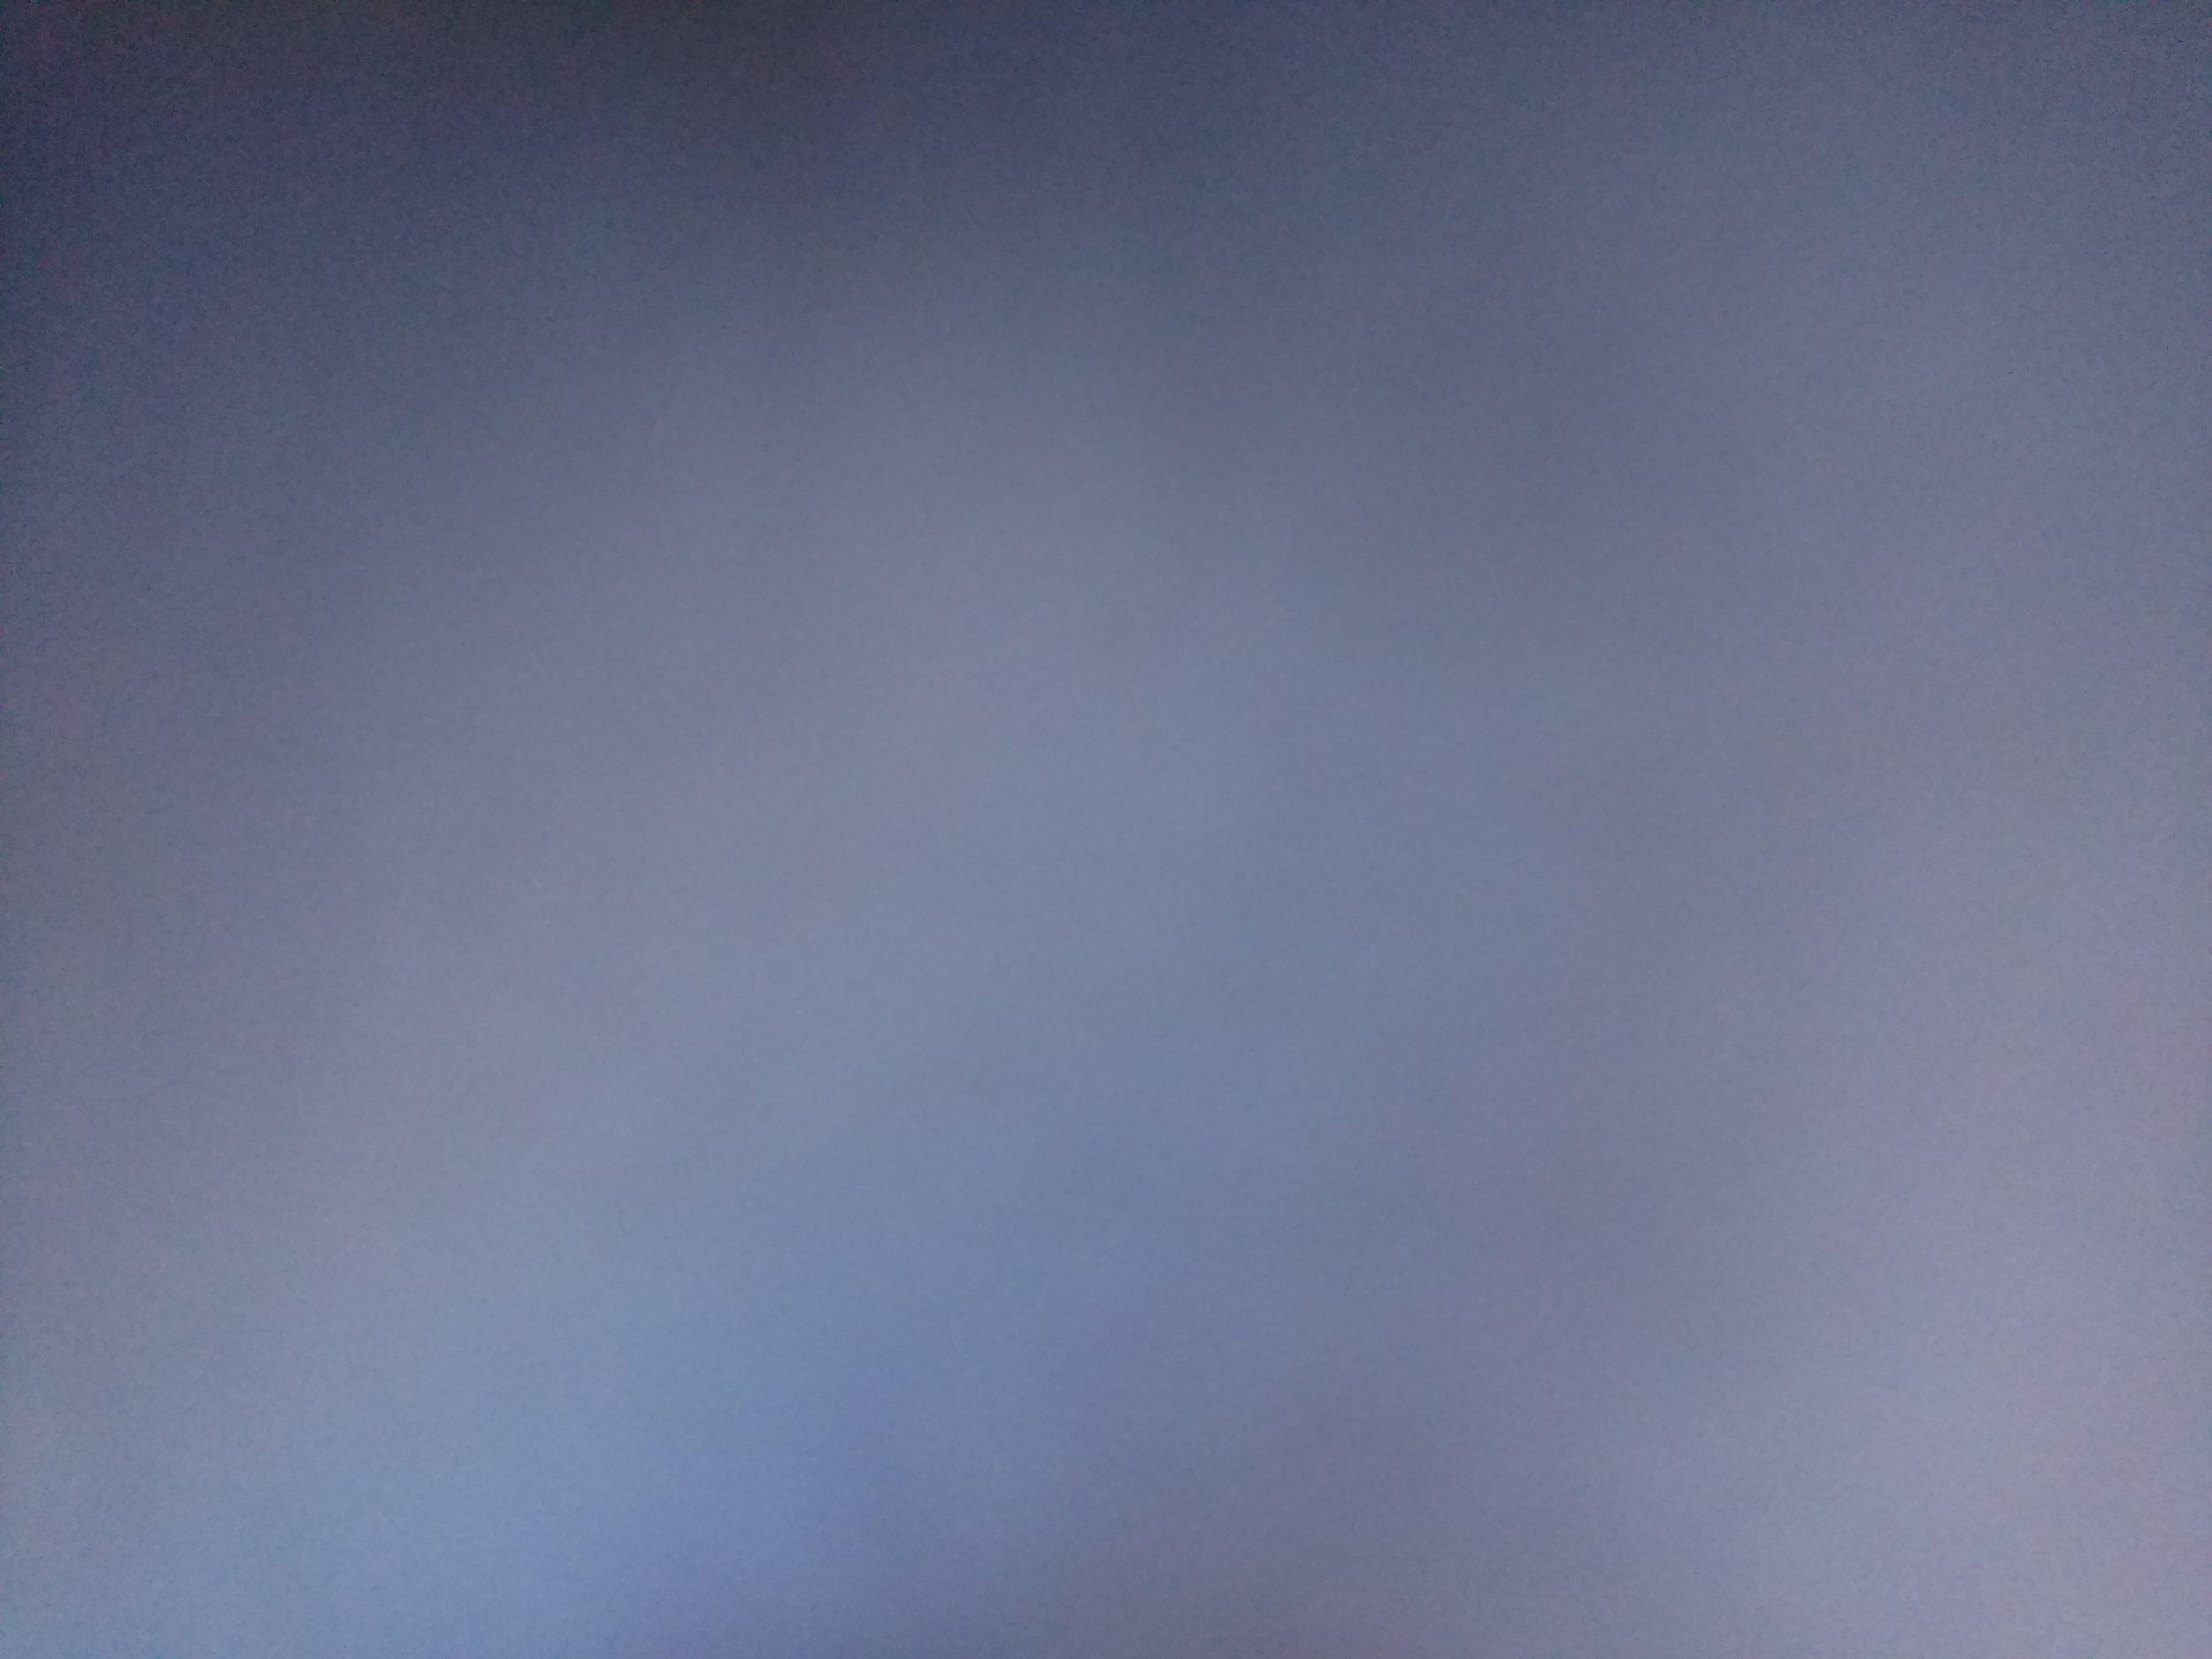 willroth-co-free-texture-gradient-099.jpg